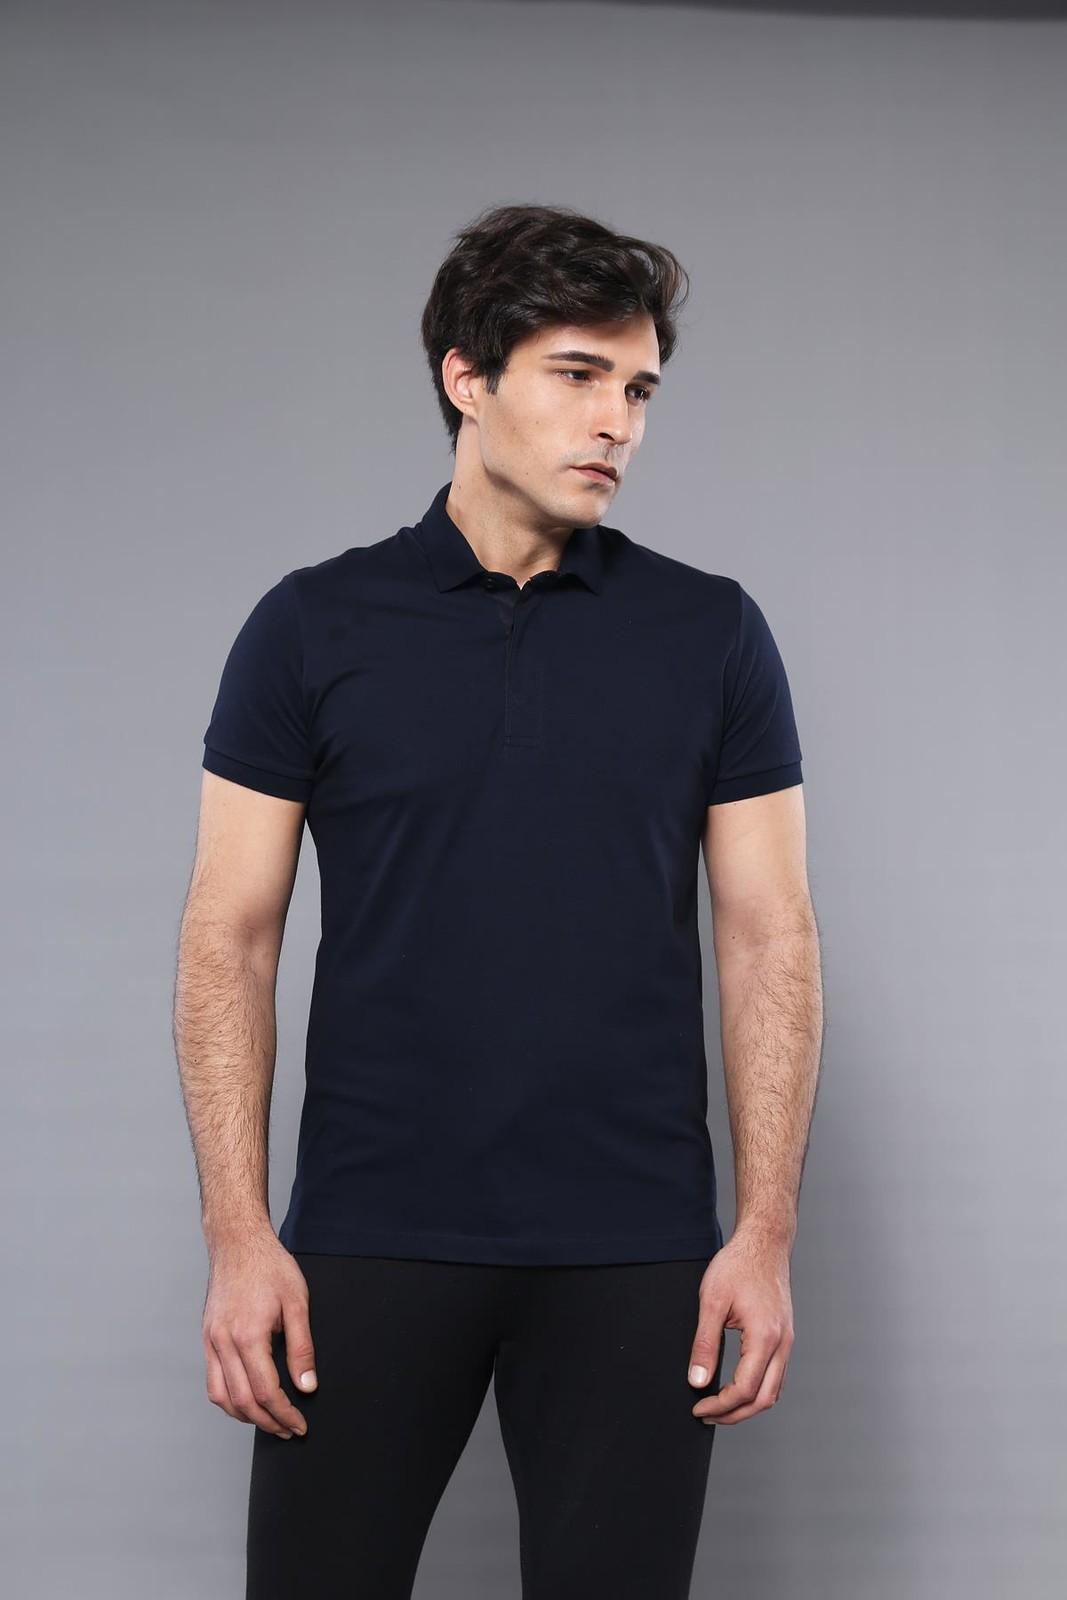 Men's Plain Navy Blue Polo T-shirt